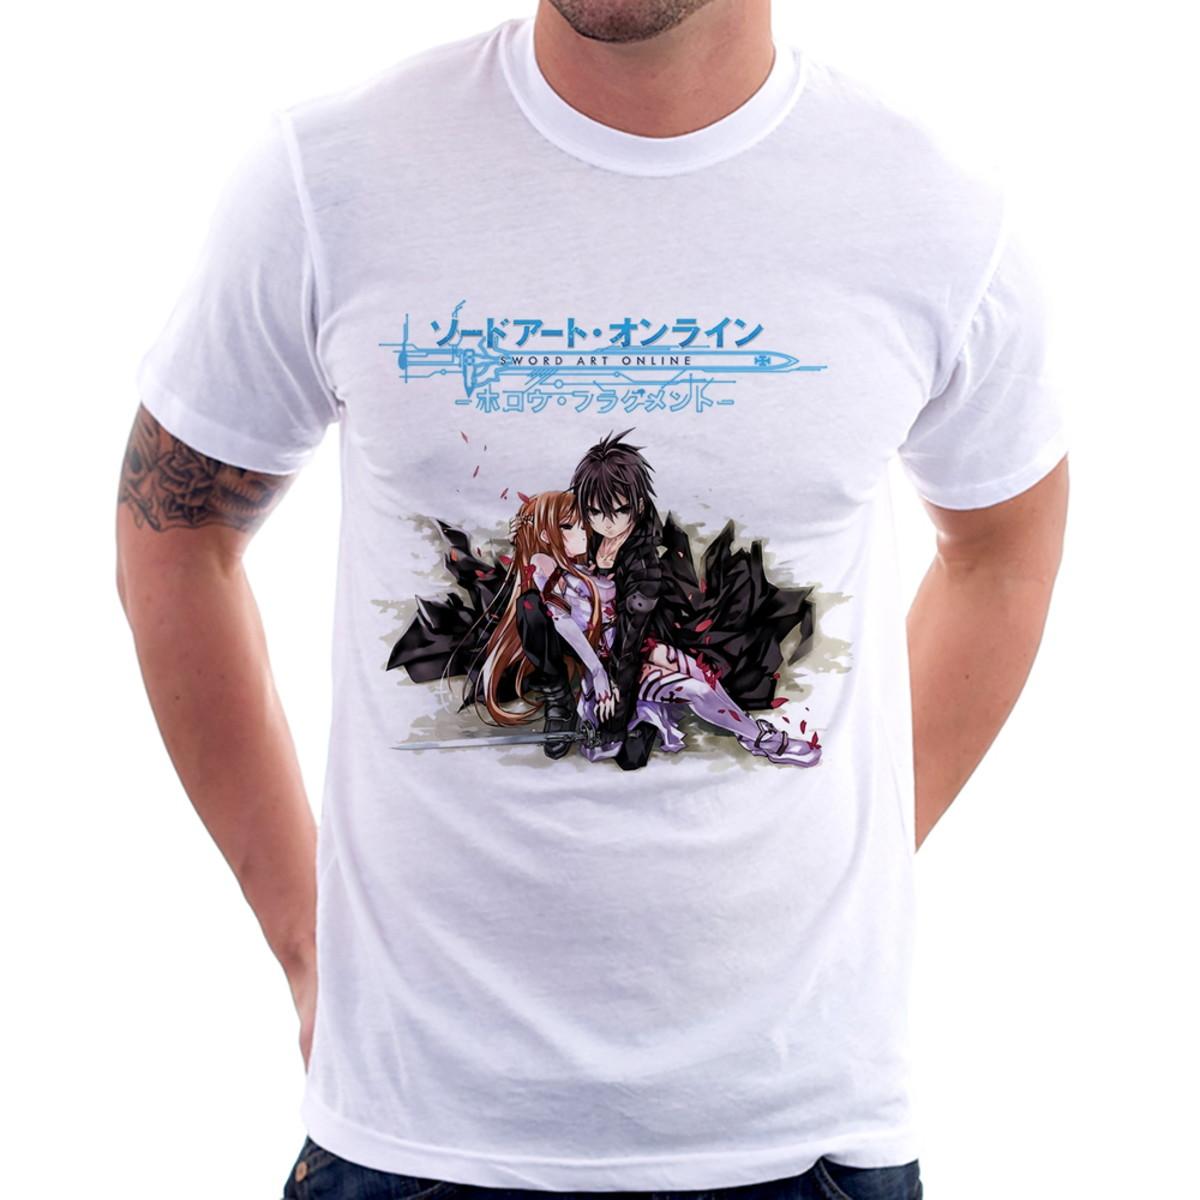 9b9ec617c Camiseta Sword Art Online Asuna Yuuki e Kirito no Elo7